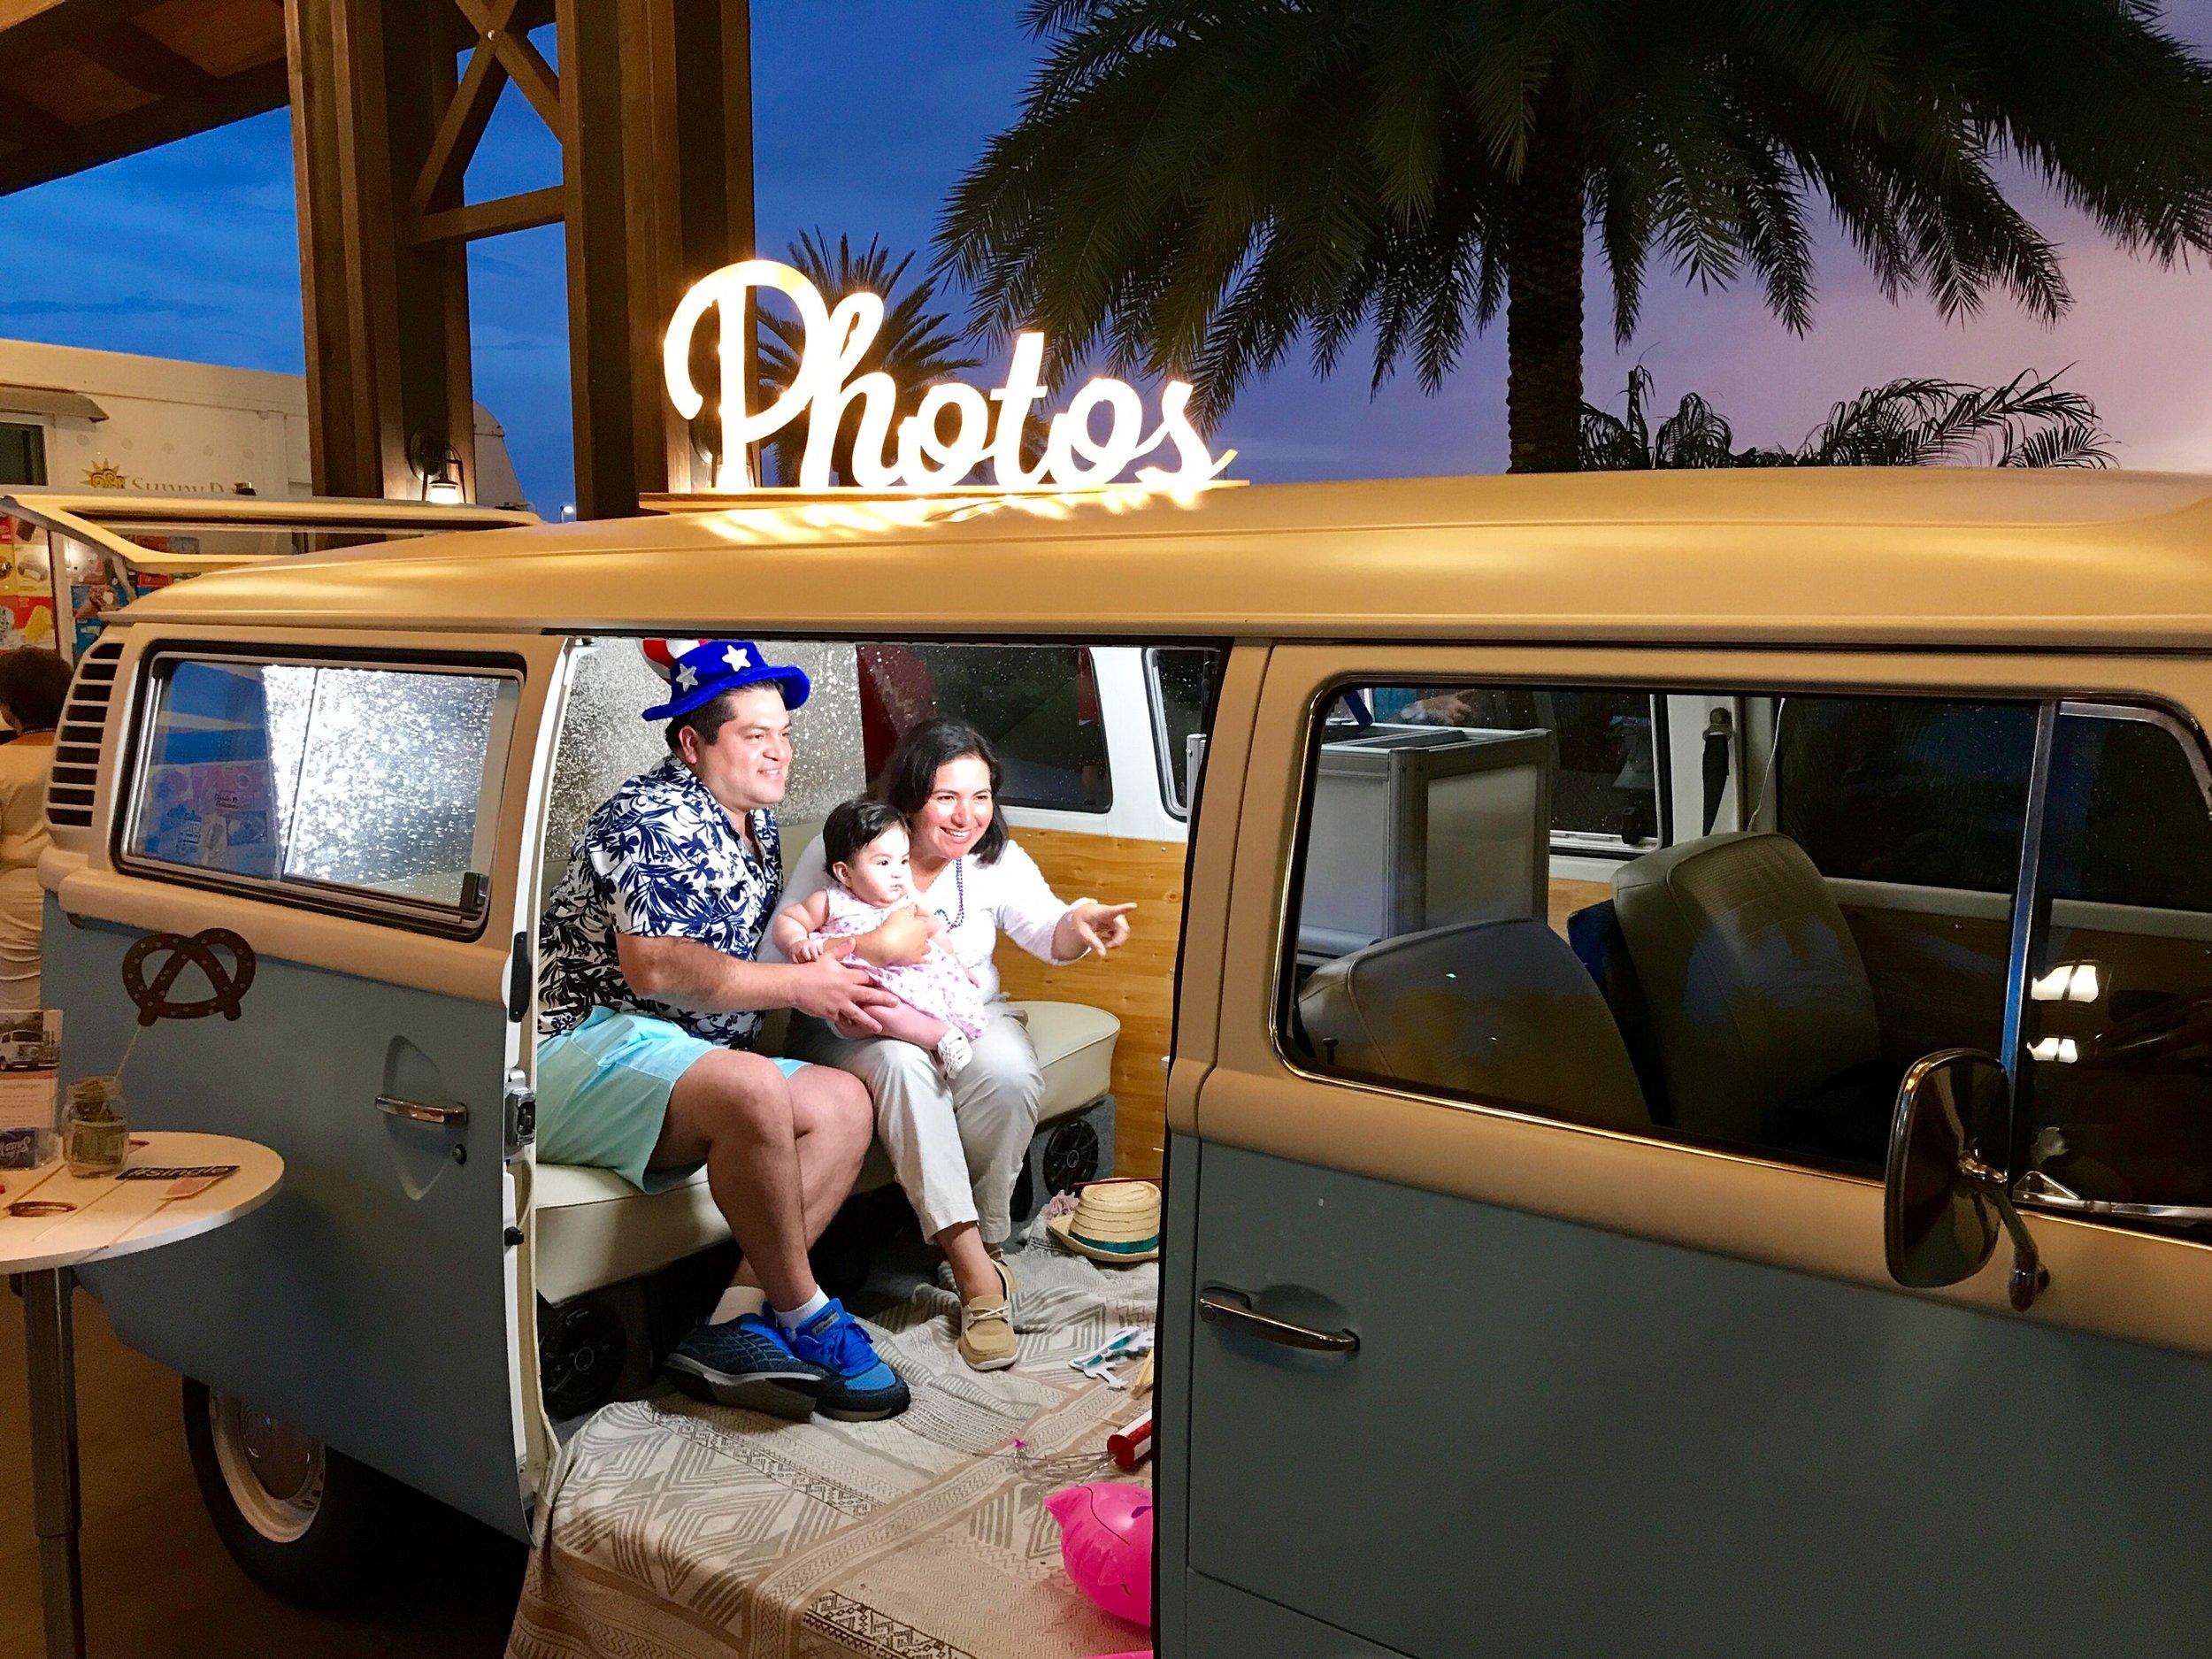 family fun in the VW bus photo booth in Bradenton FL.